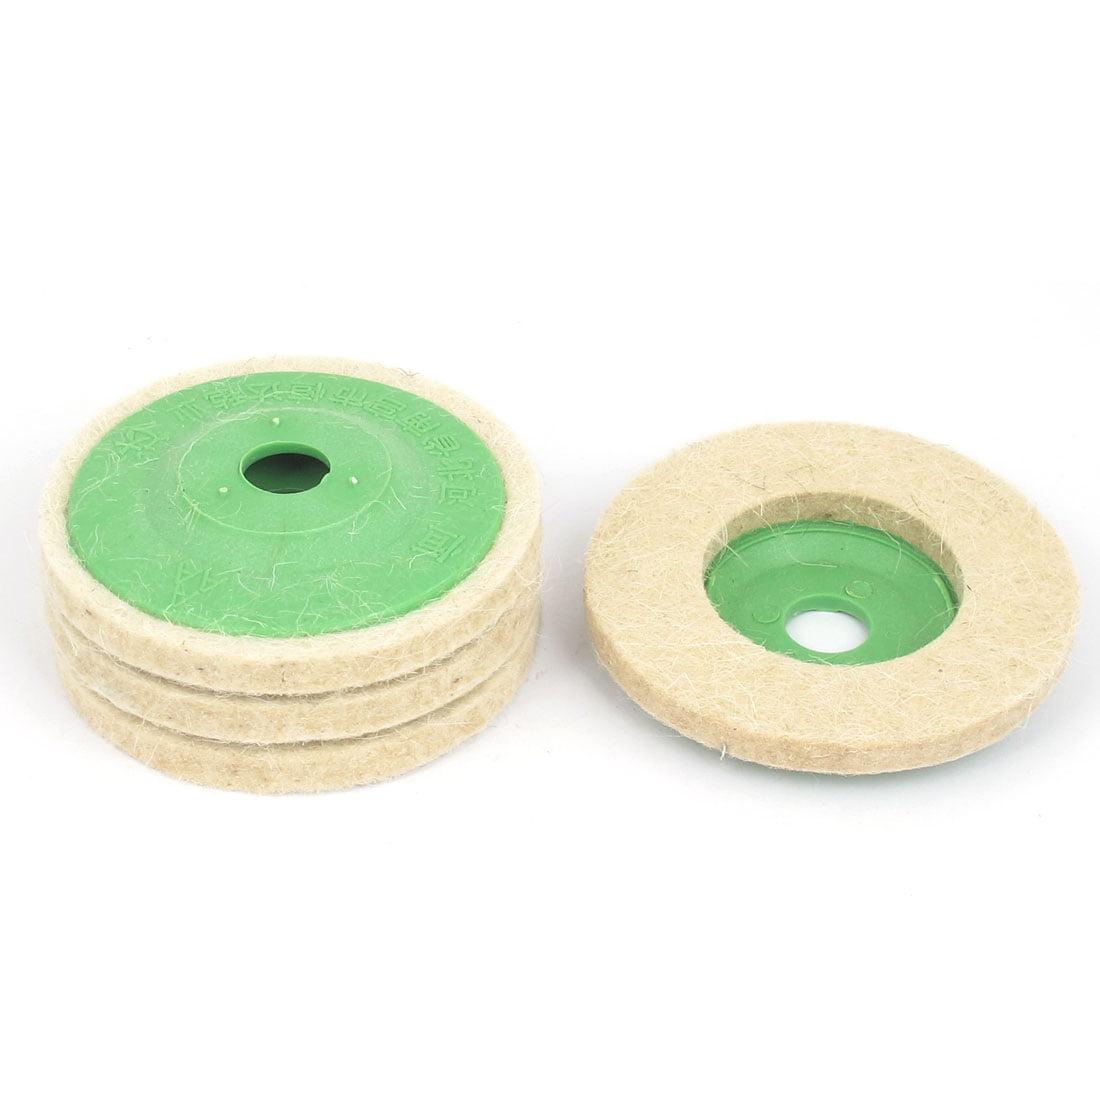 Unique Bargains 95mm Outer Dia Wool Tools Felt Polishing Wheel Buffing Discs Pads Beige 4pcs